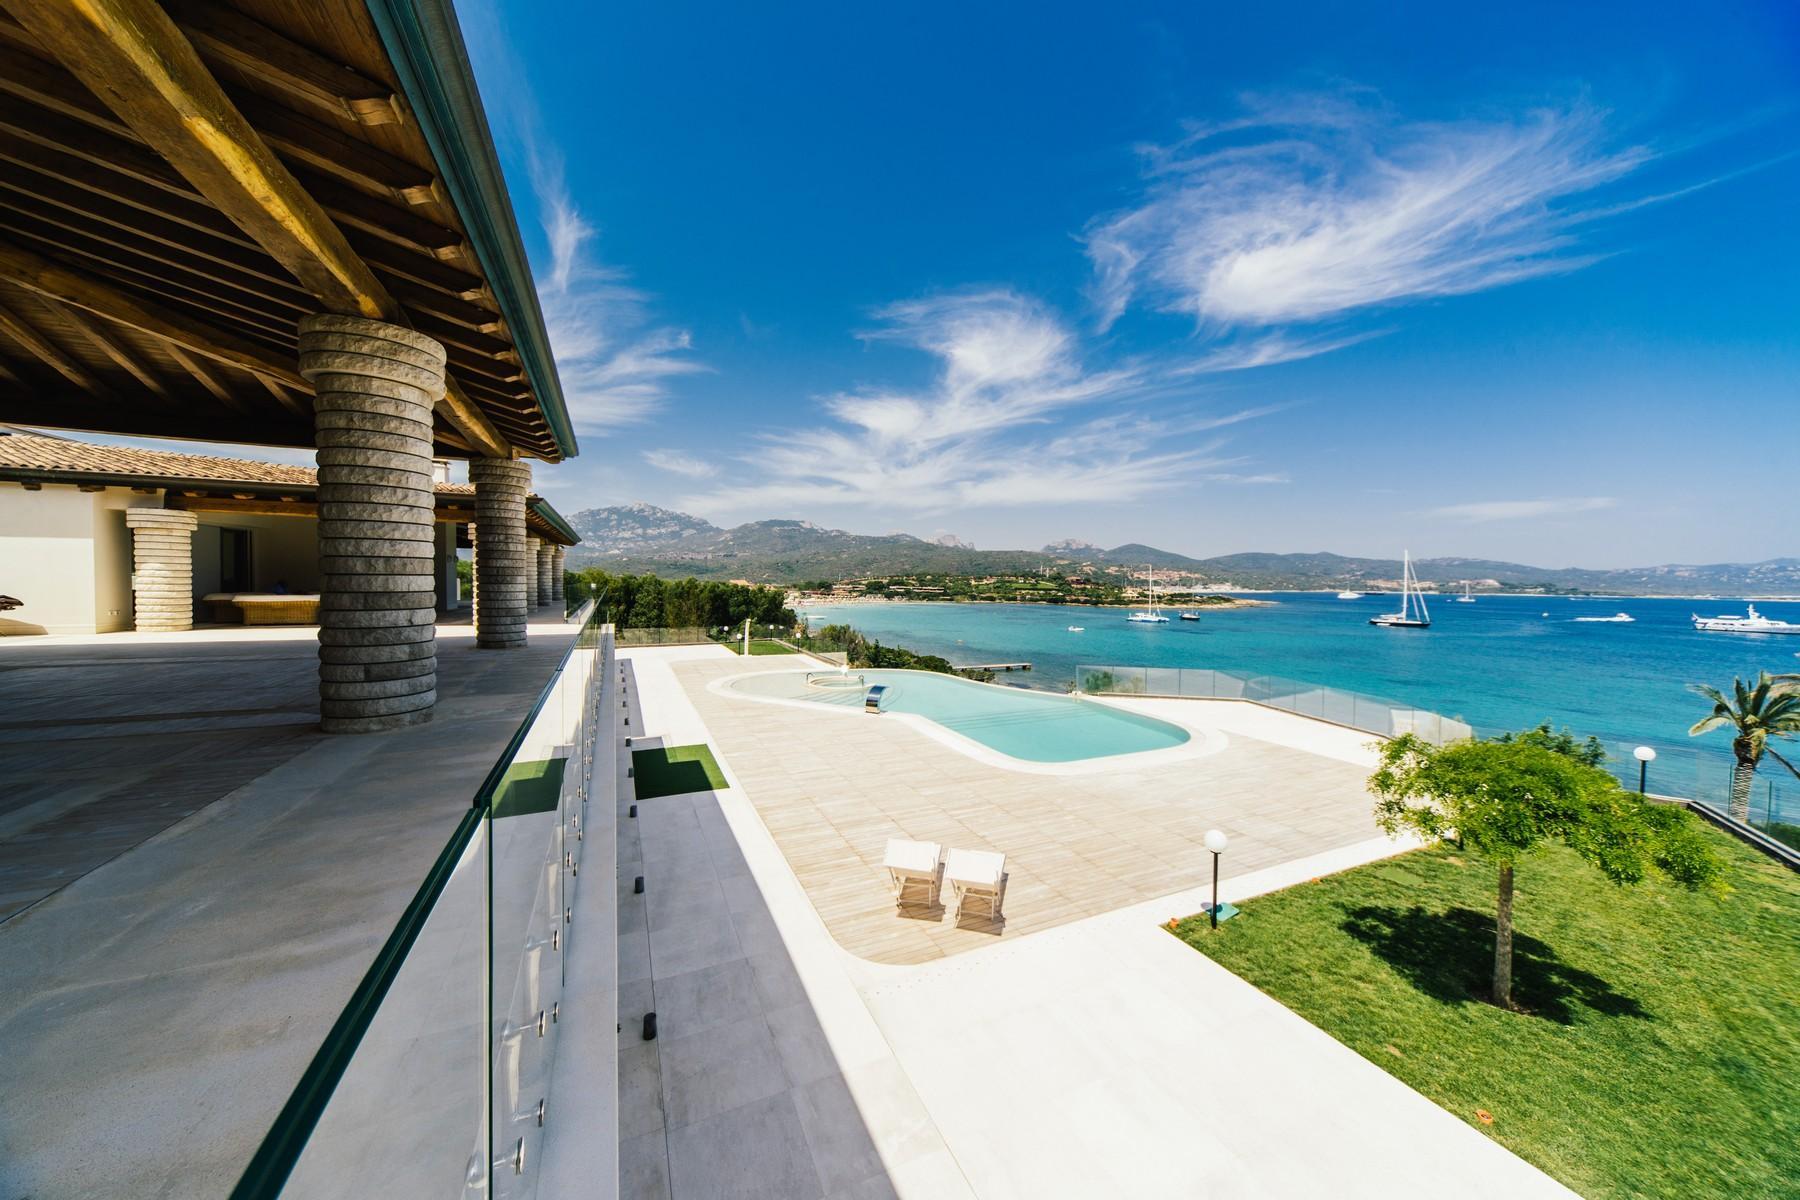 Villa unique en bord de mer sur la côte d'Émeraude - 2